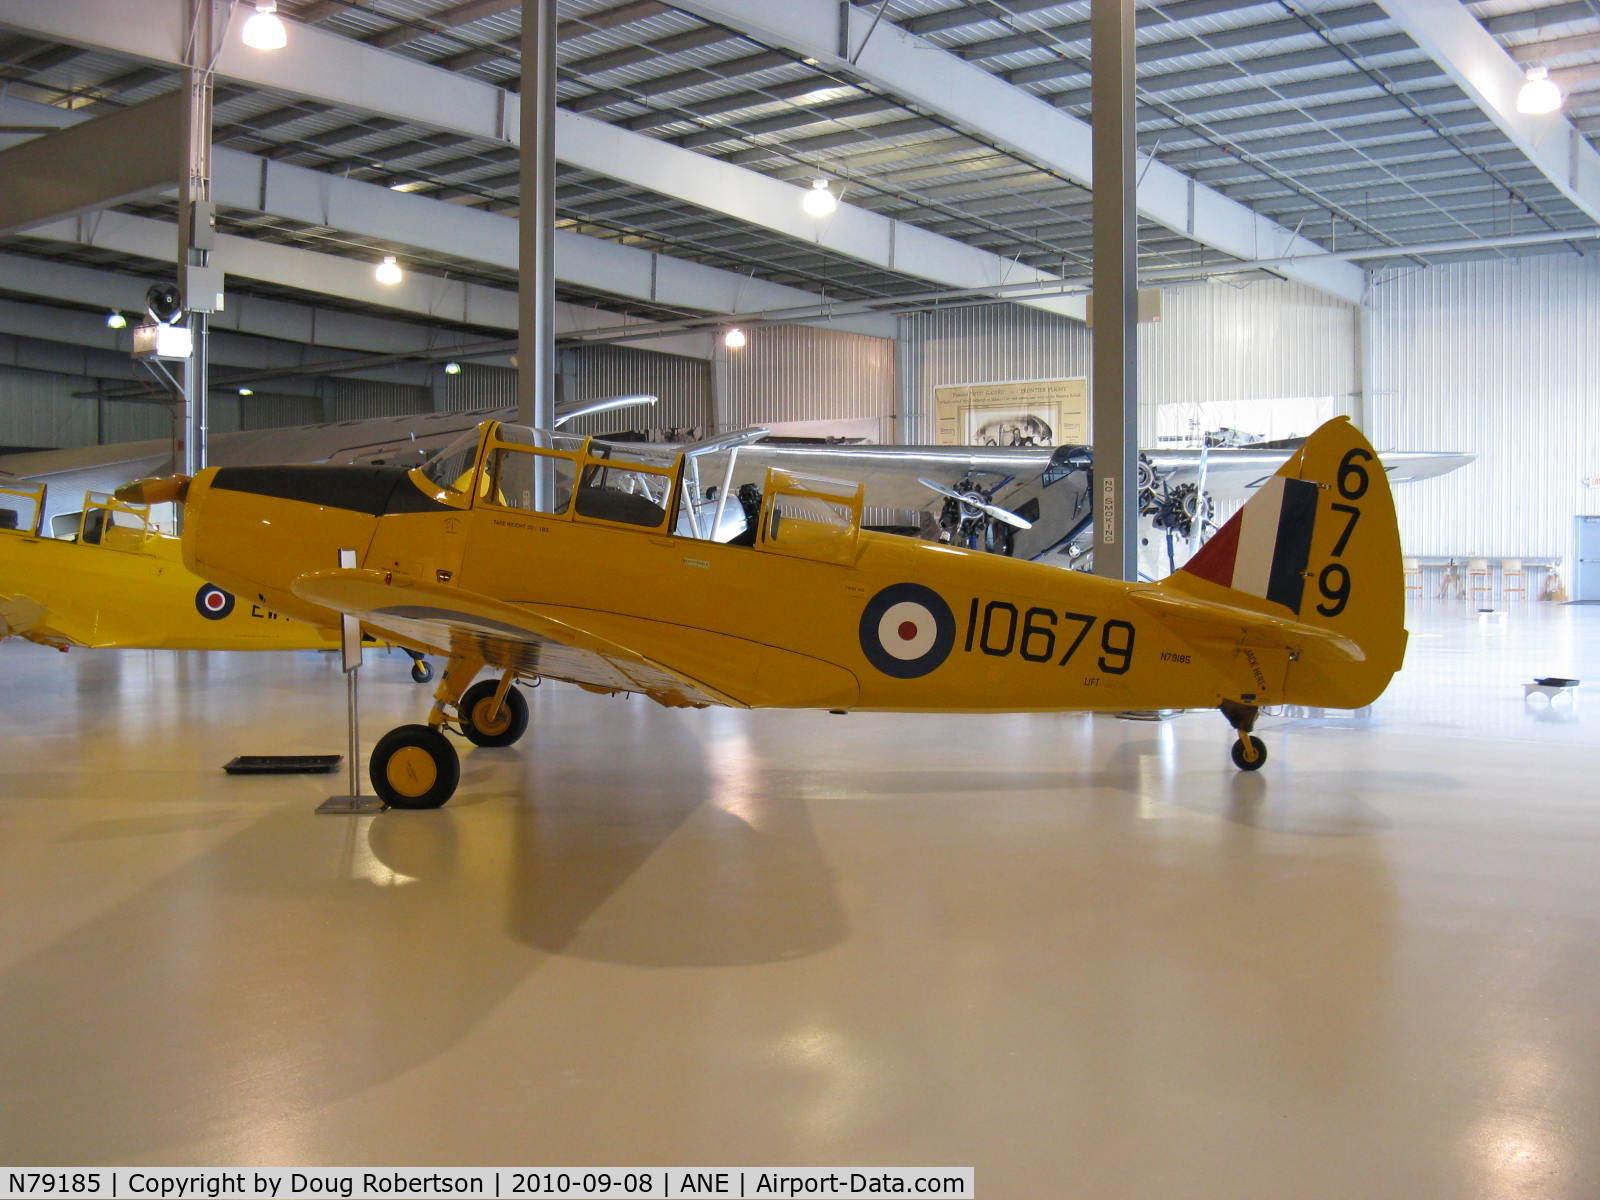 N79185, 1942 Fairchild M-62A-4 C/N FC180, 1942 Fairchild M-62A-4 as PT-26, Fairchild 6-440C-2 175 Hp, at Golden Wings Museum